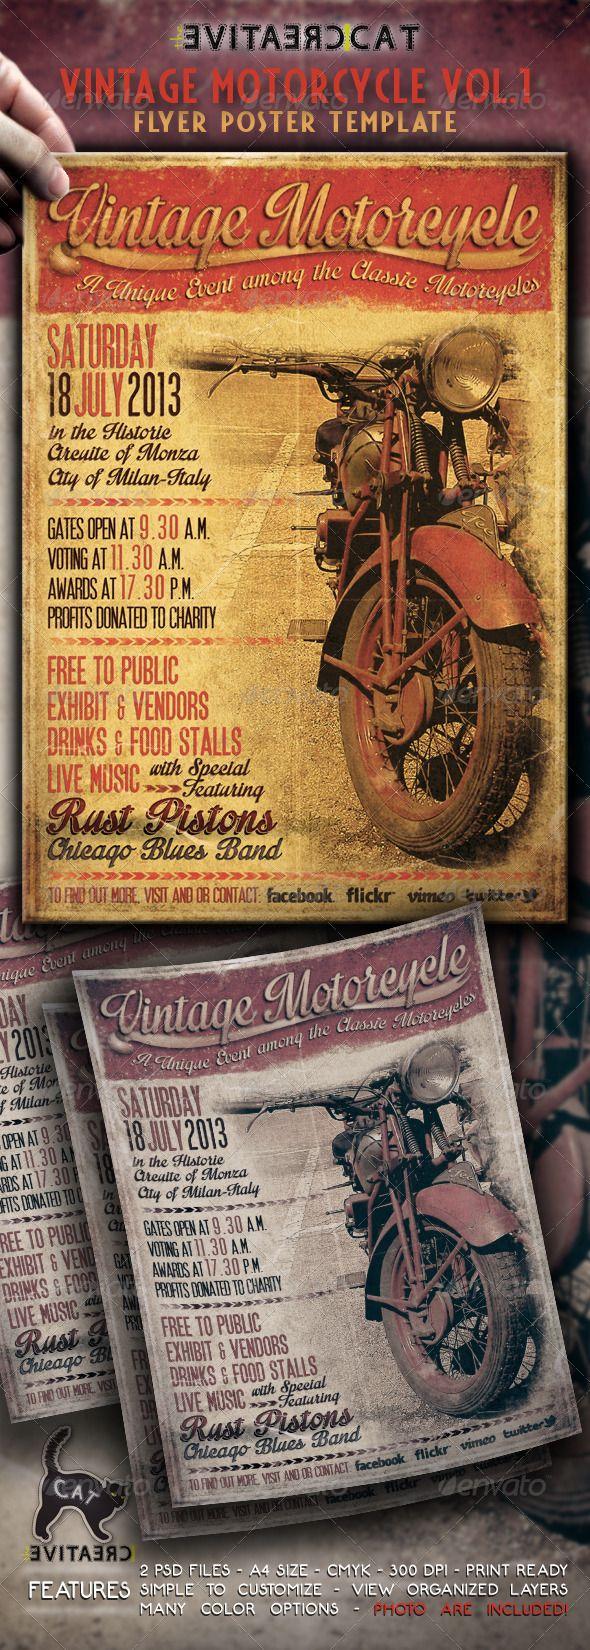 Vintage Motorcycle Flyer Poster Vol 1 Flyer Examples Pinterest